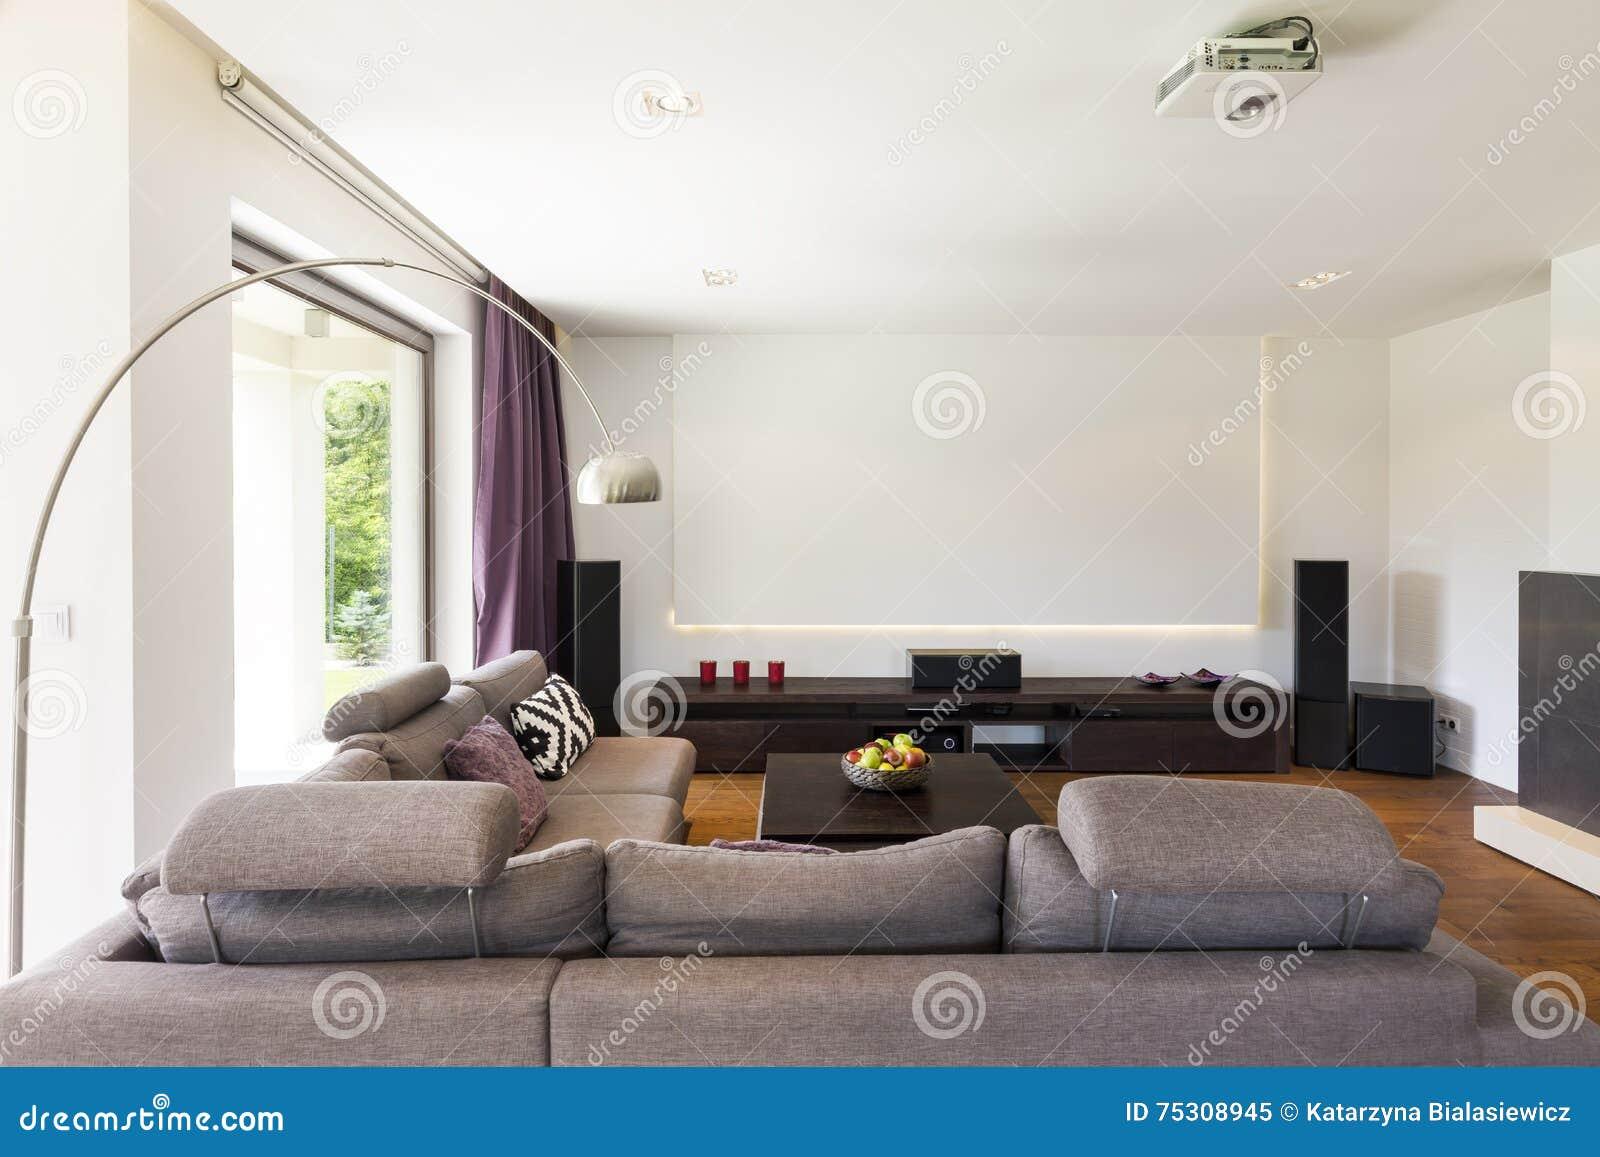 New Home Theatre Idea Stock Image Image Of Apartment 75308945